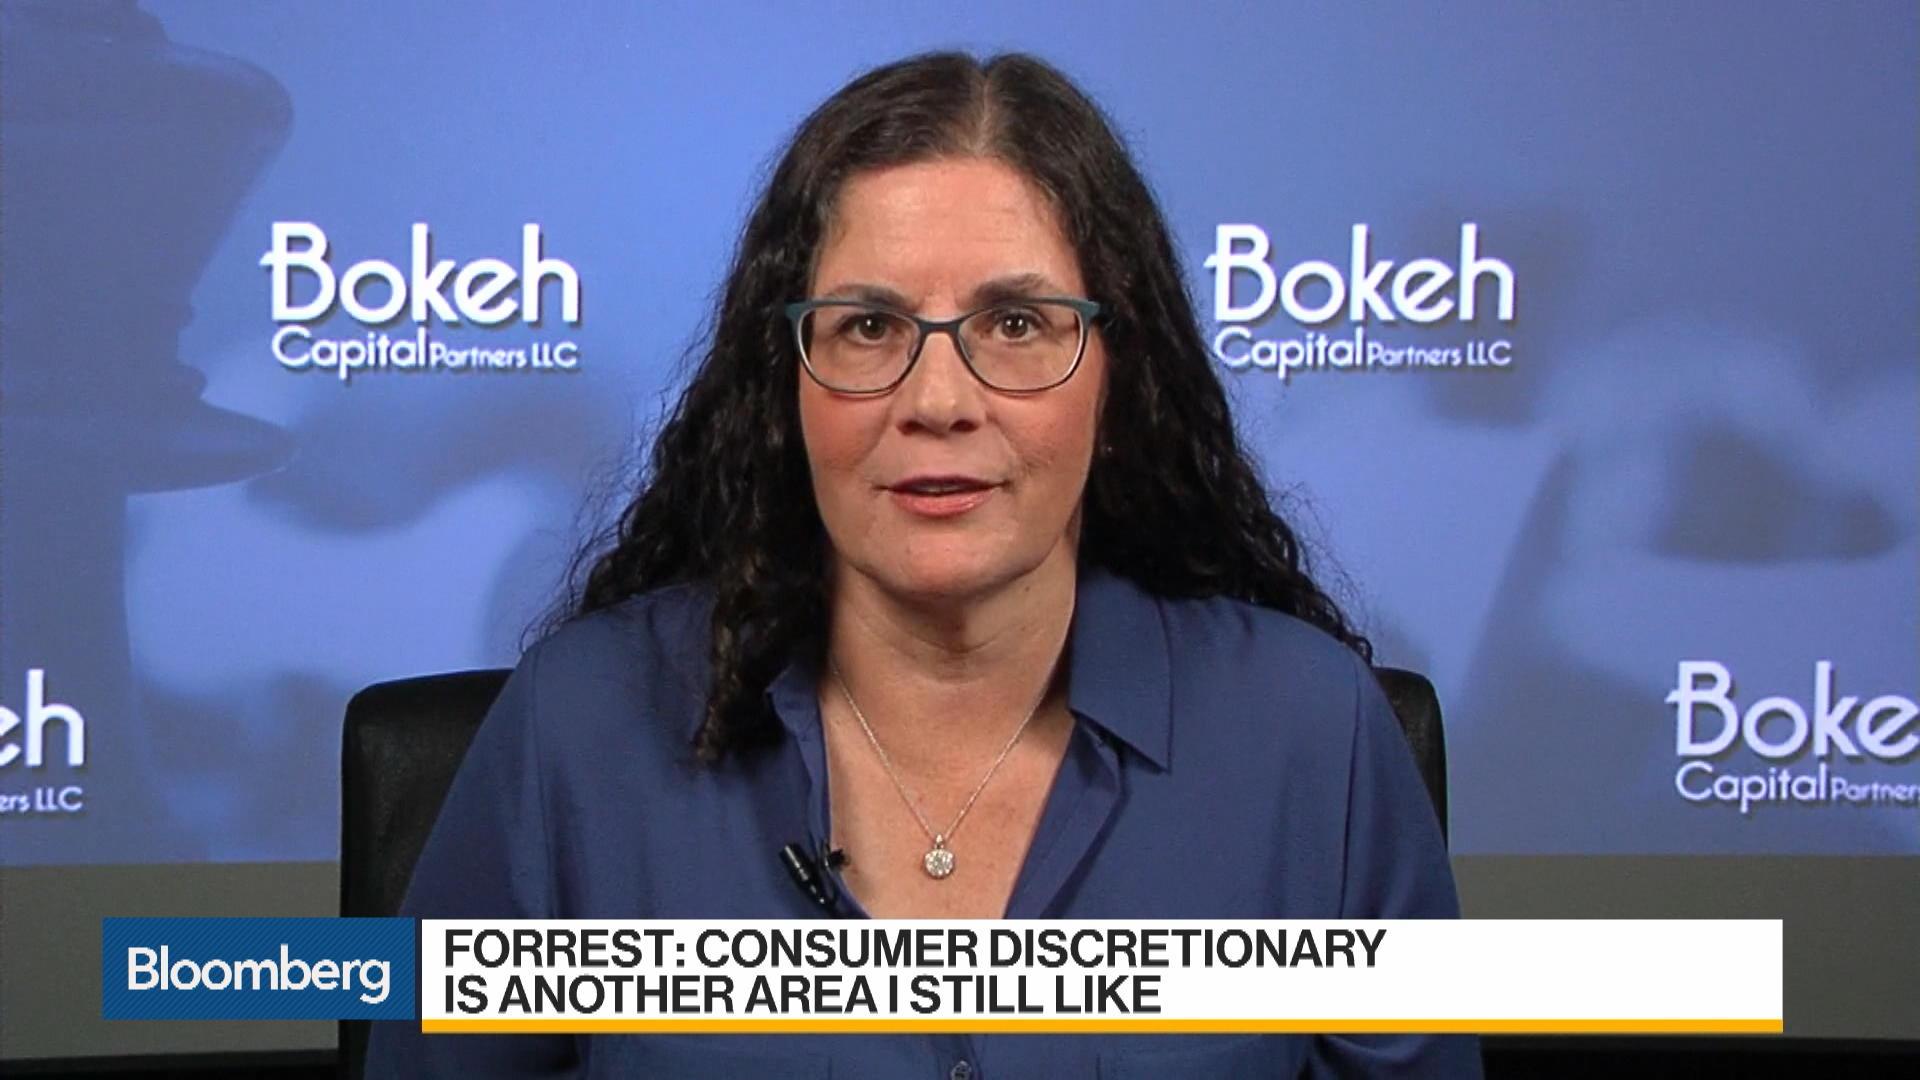 Kim Forrest, CIO of Bokeh Capital Partners, on U.S. stocks